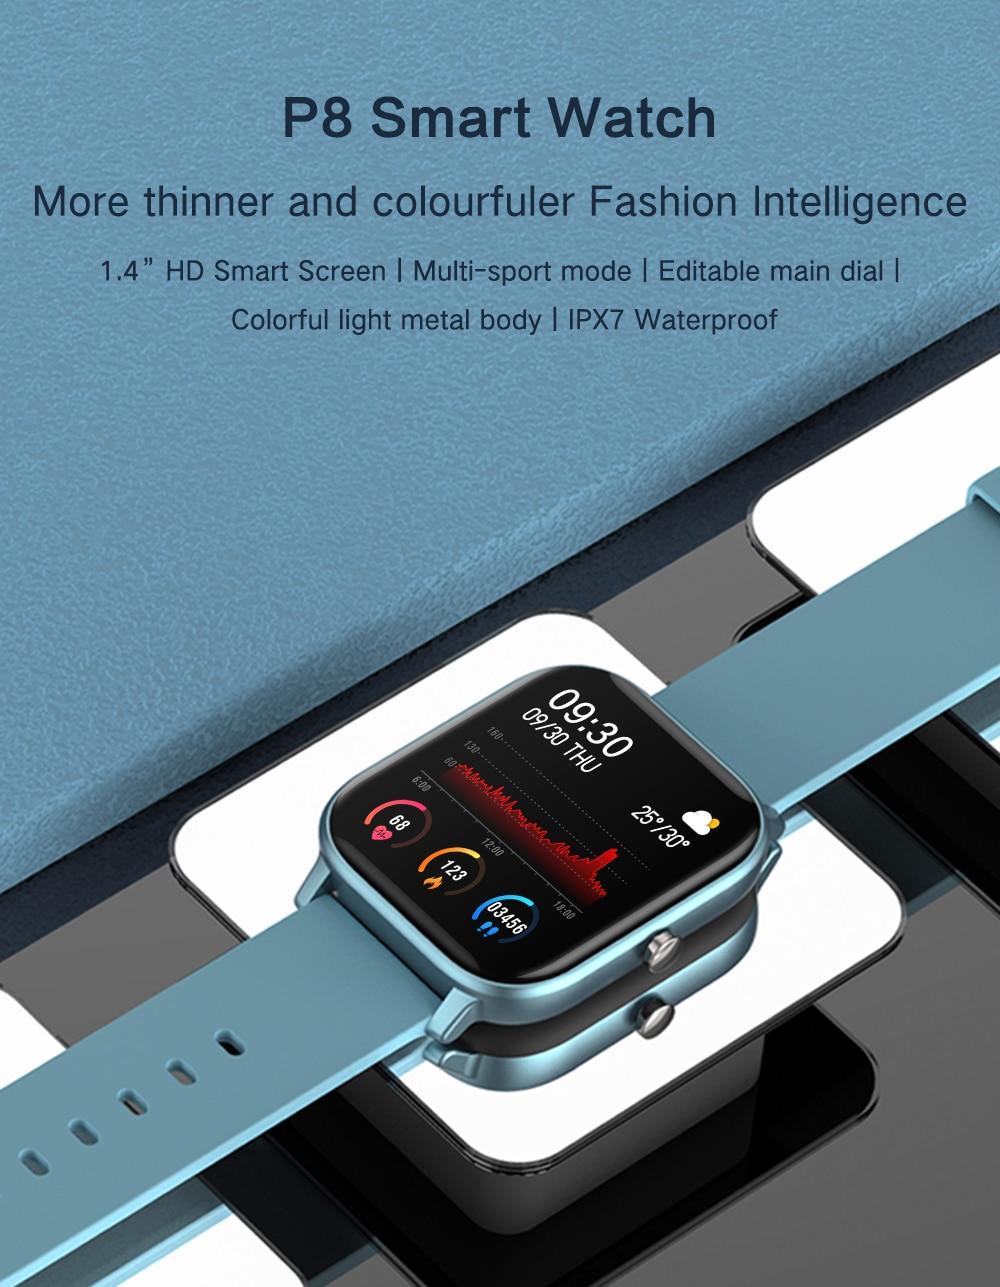 H2839f493c4304764b0a0d827de1e20b1V 2021 New P8 Color Screen Smart Watch Women men Full Touch Fitness Tracker Blood Pressure Smart Clock Women Smartwatch for Xiaomi